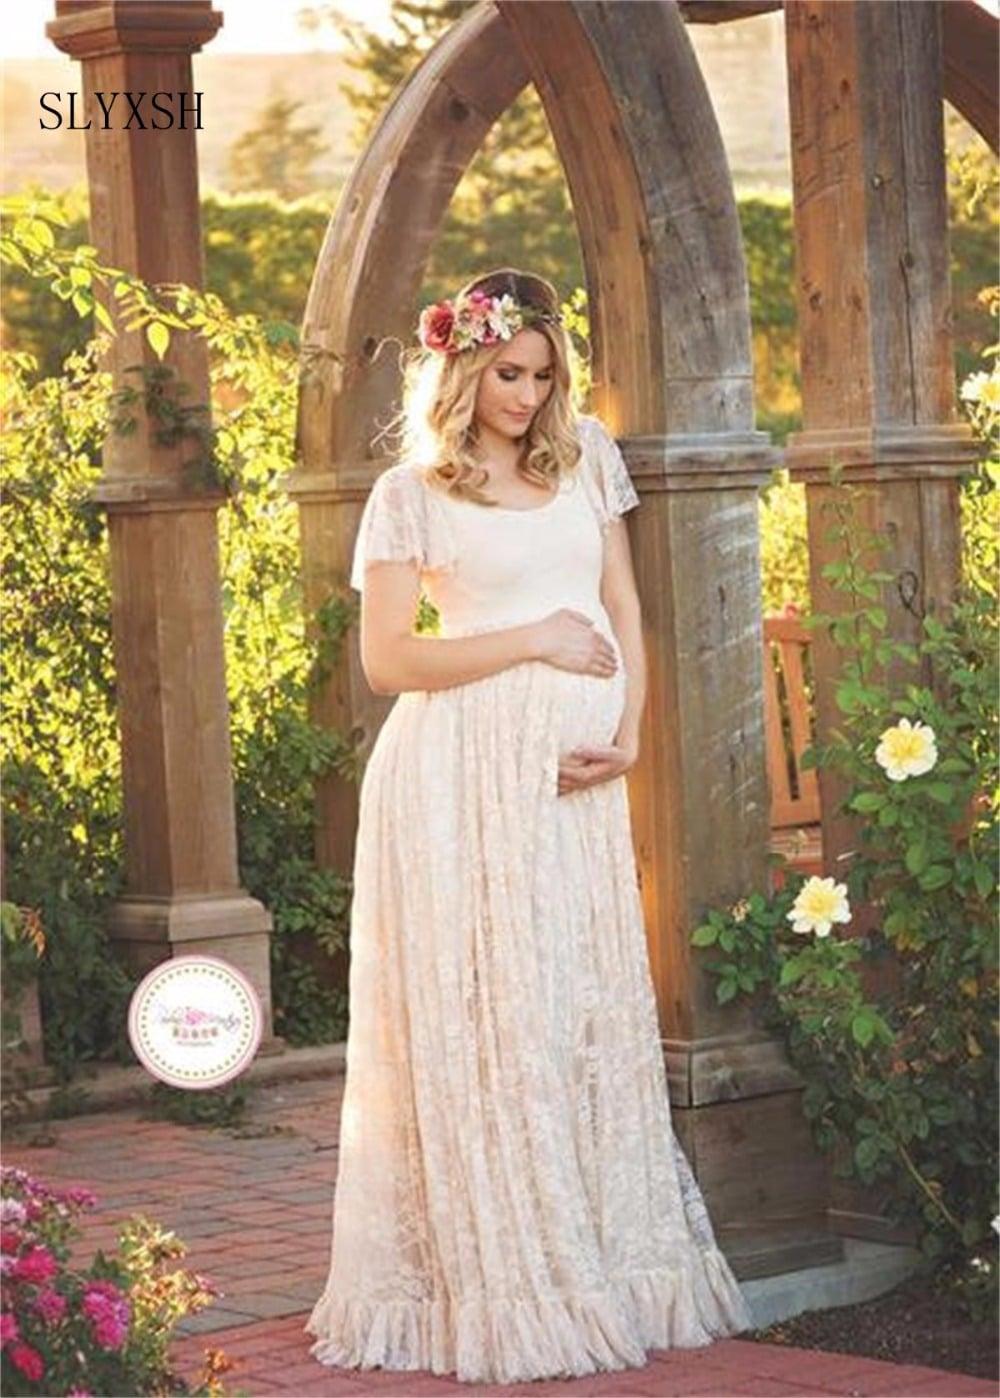 SLYXSHNew Maternity Photography Props Pregnancy Clothes Maternity ...